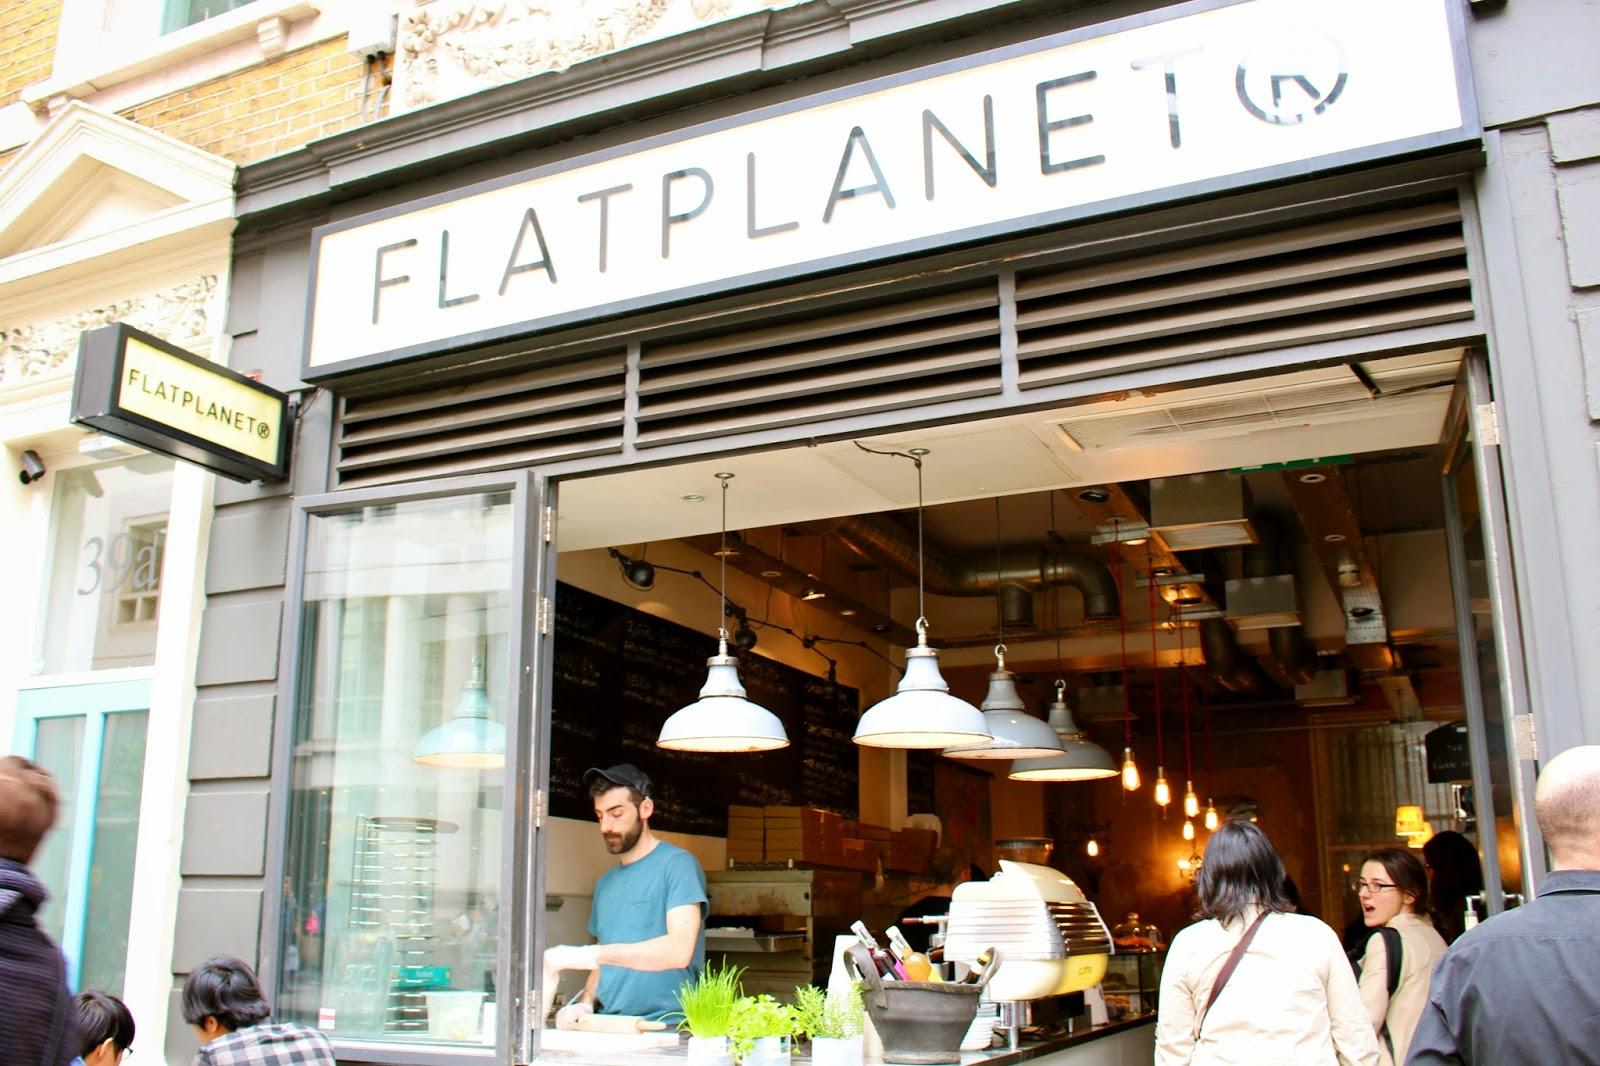 London free wifi study spots Flat Planet